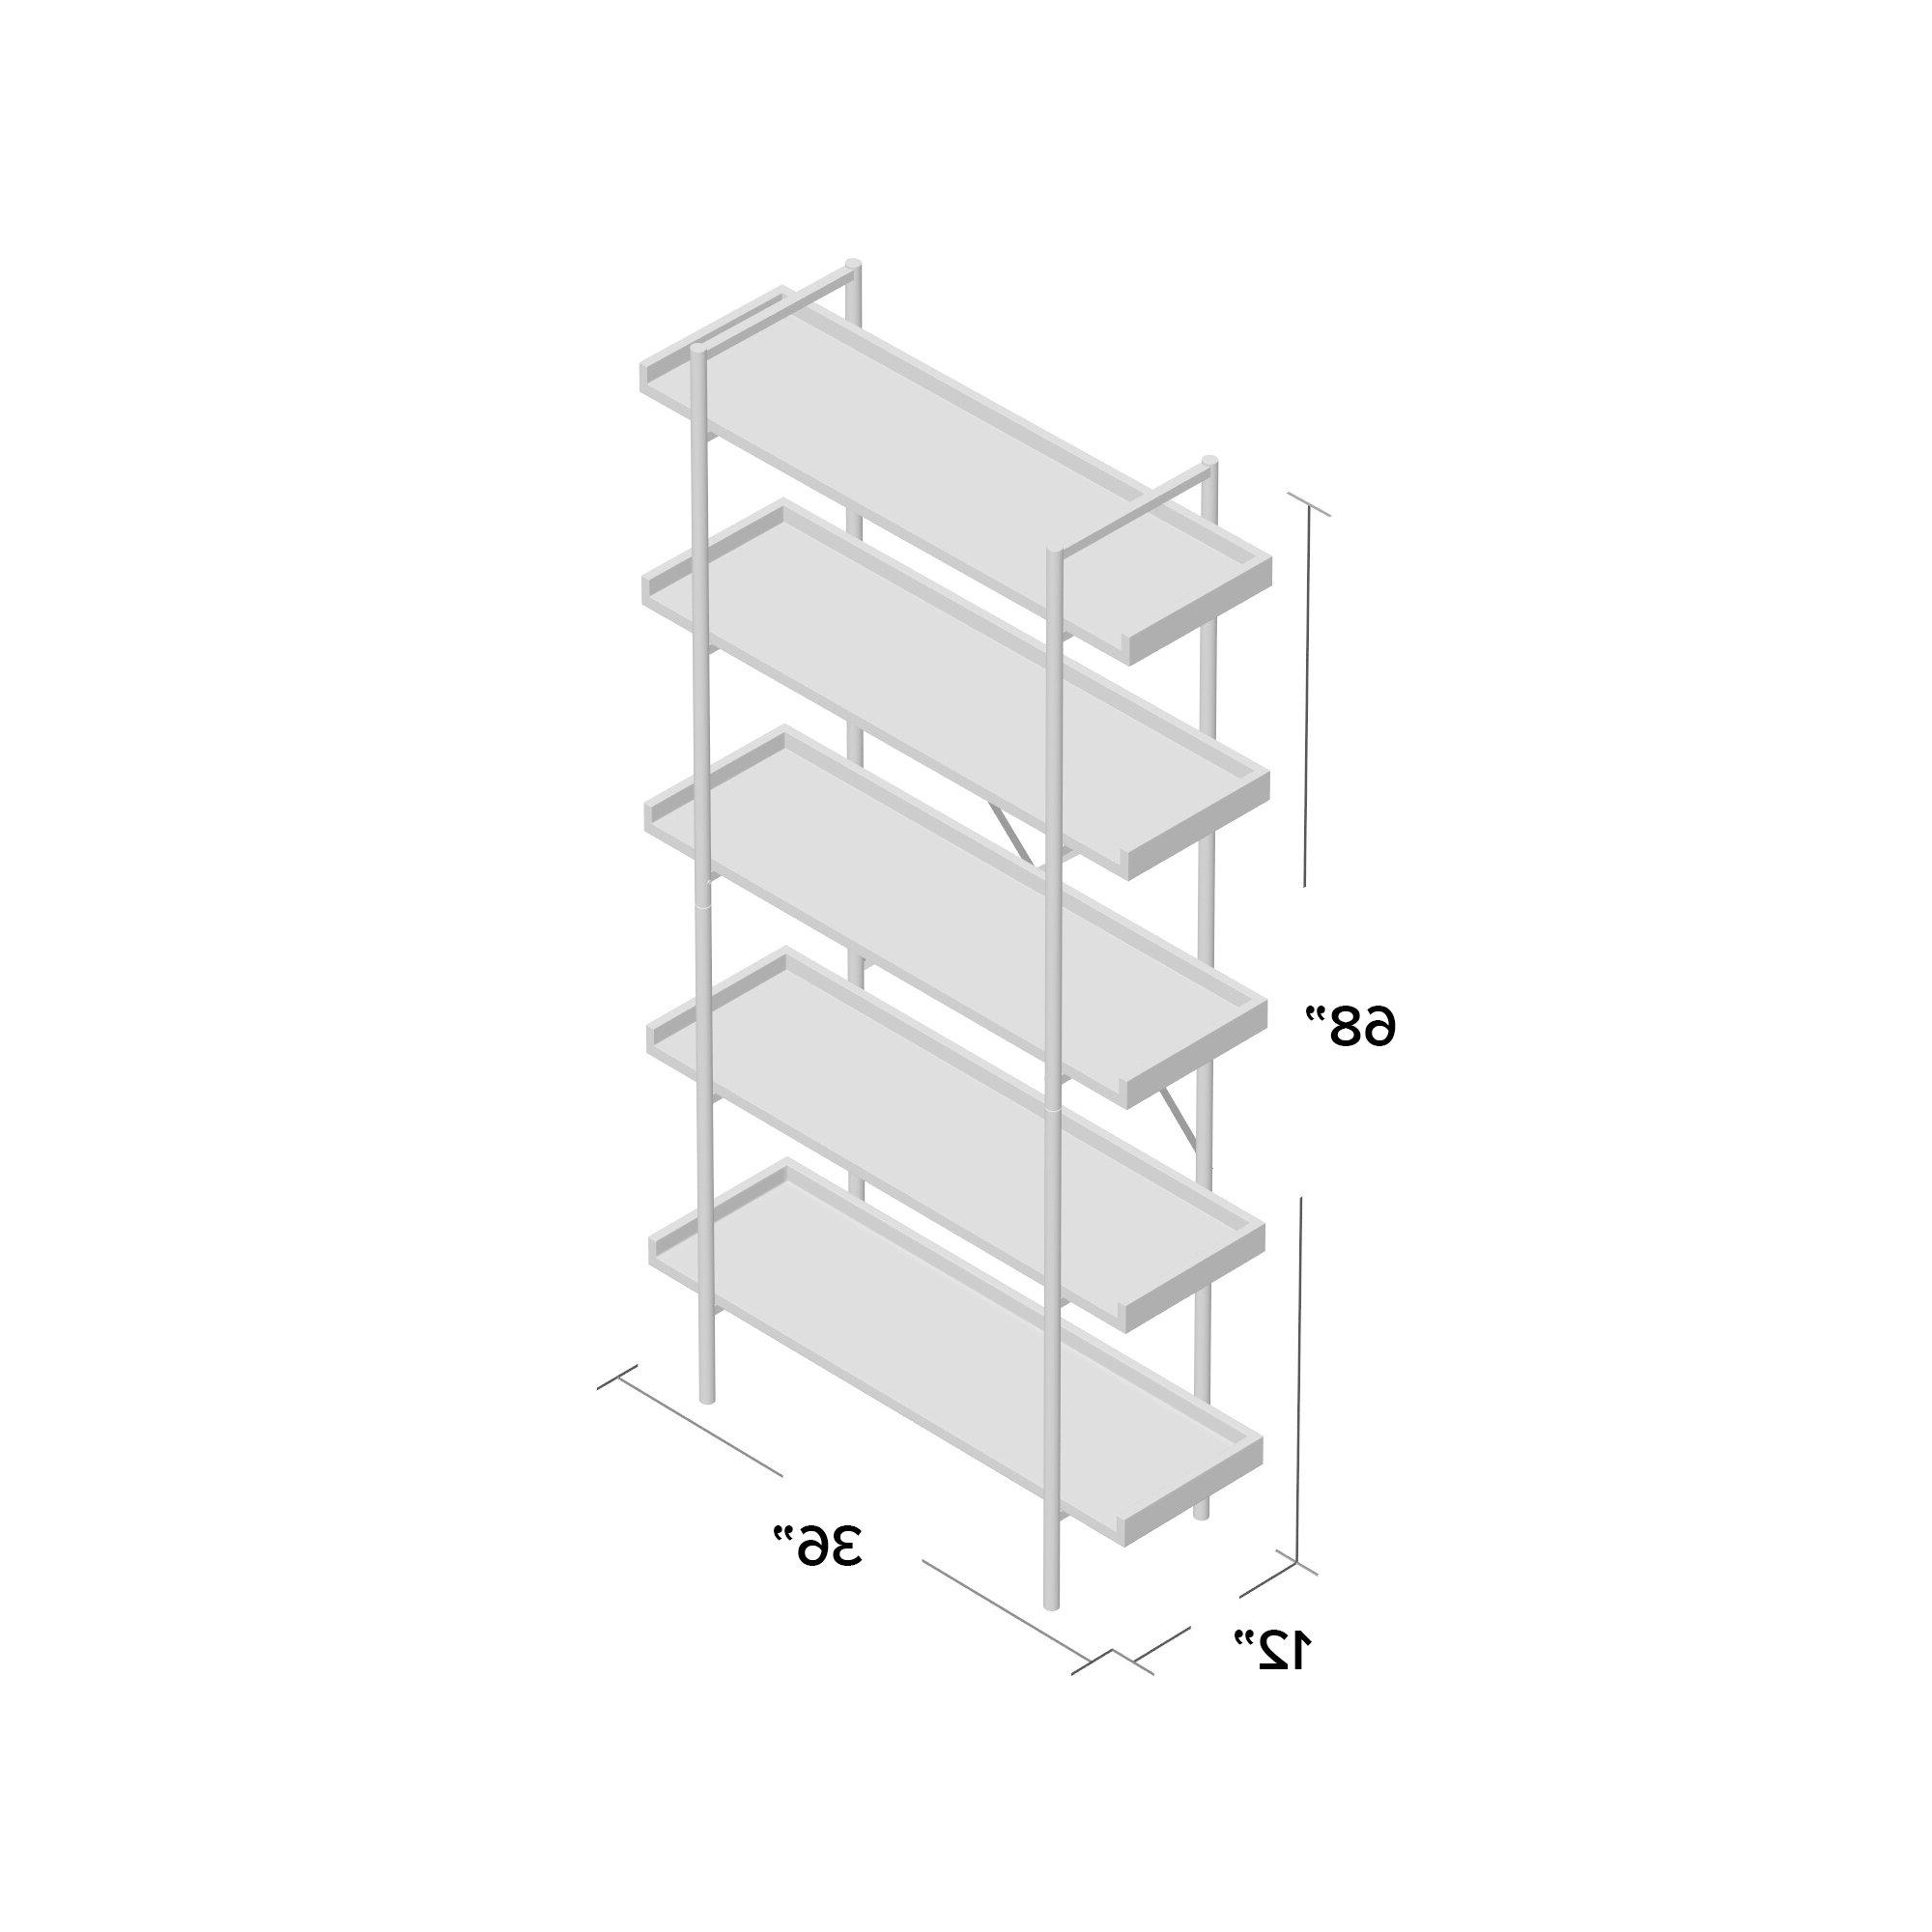 Tinoco Storage Shelf Standard Bookcases In Preferred Williston Forge Swindell Standard Bookcase (View 15 of 20)